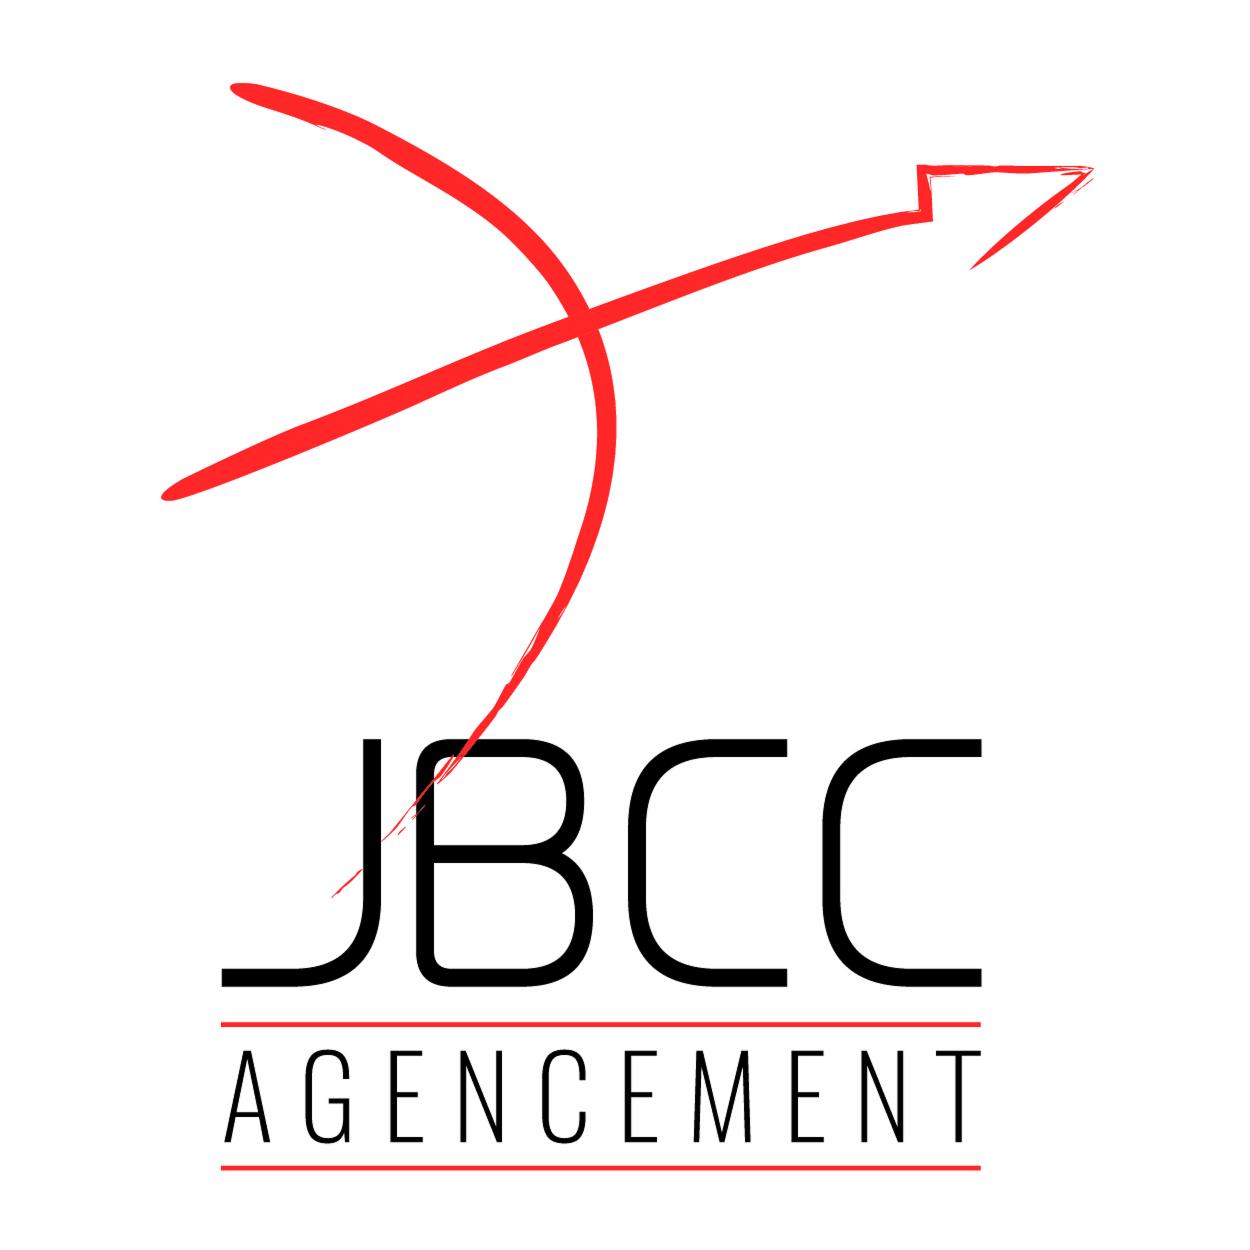 JBCC Agenceur